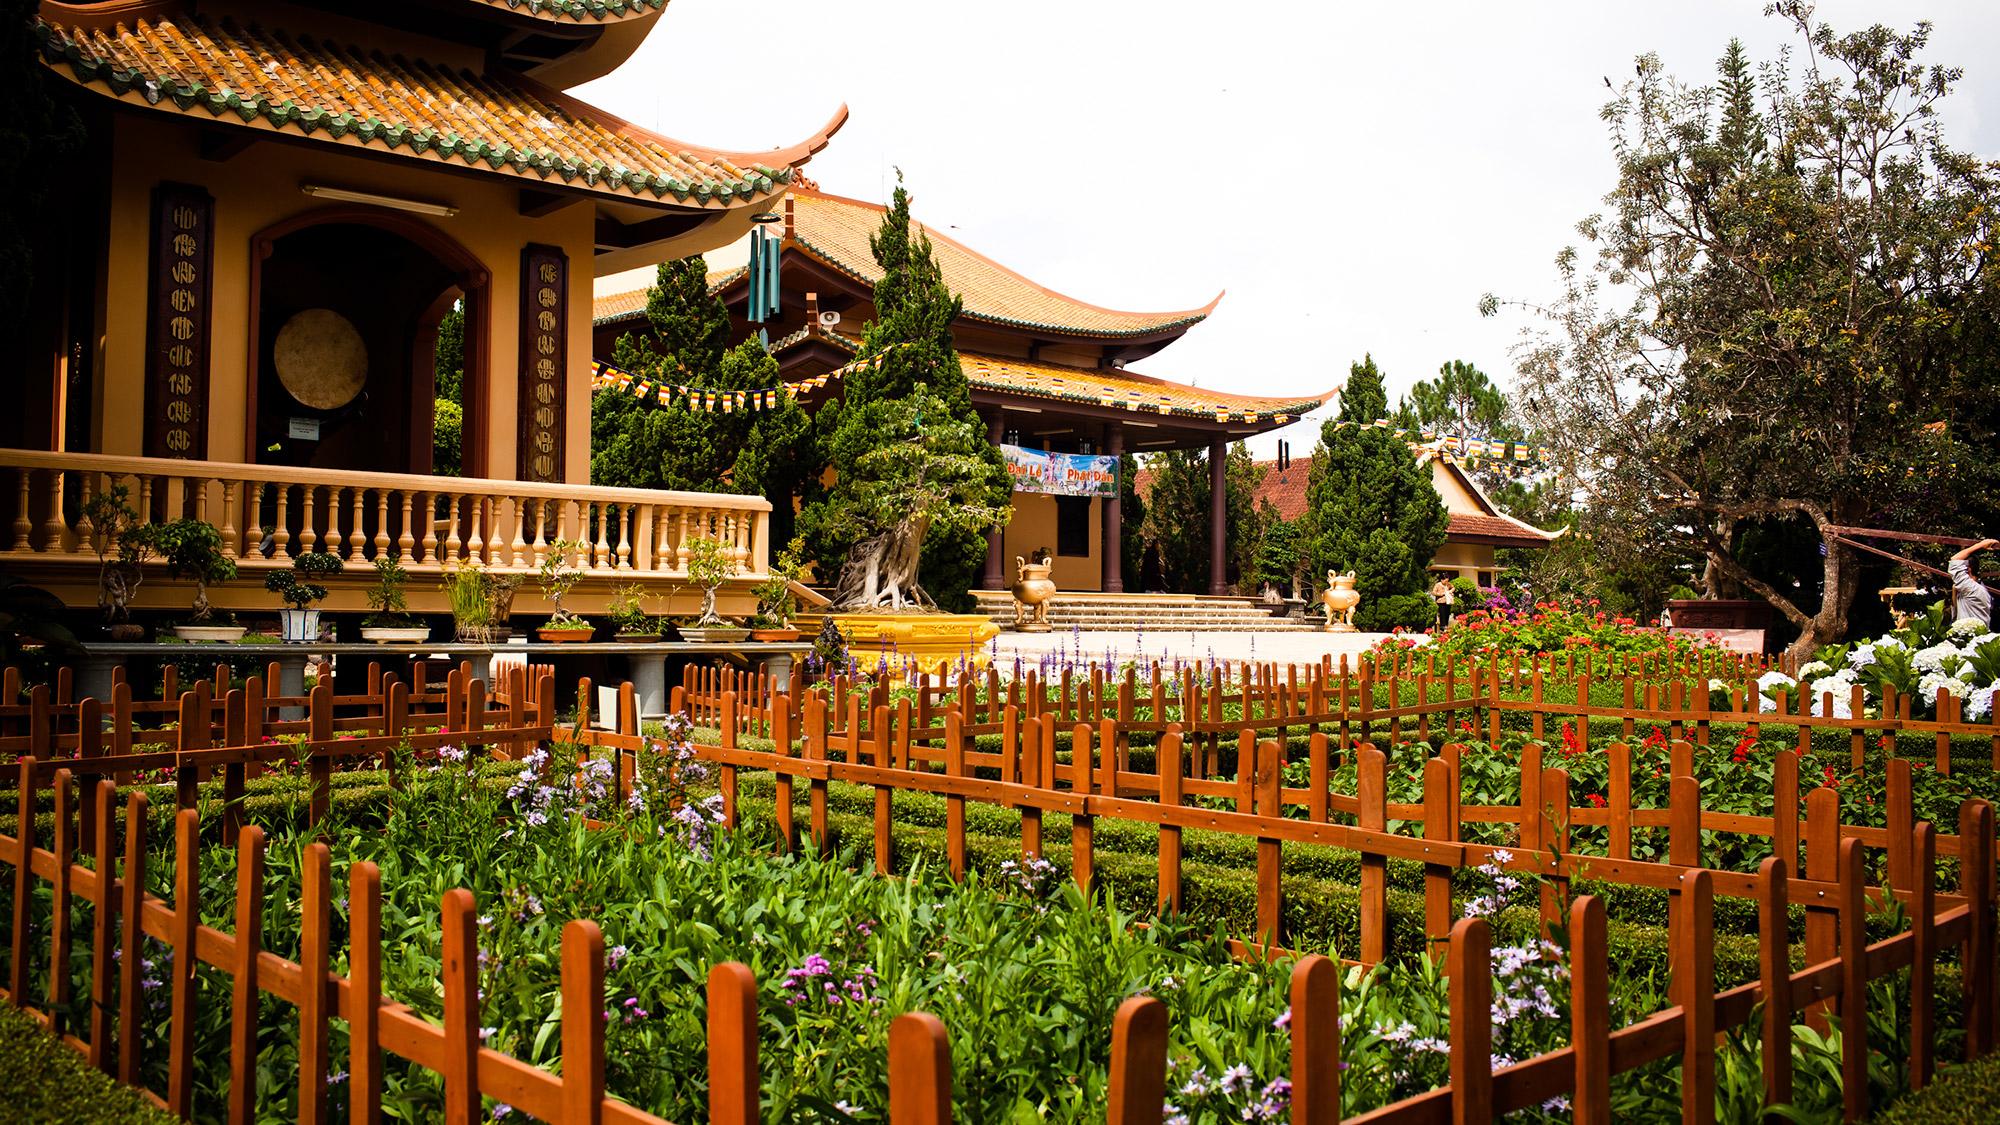 Visiter le monastère Truc Lam dalat